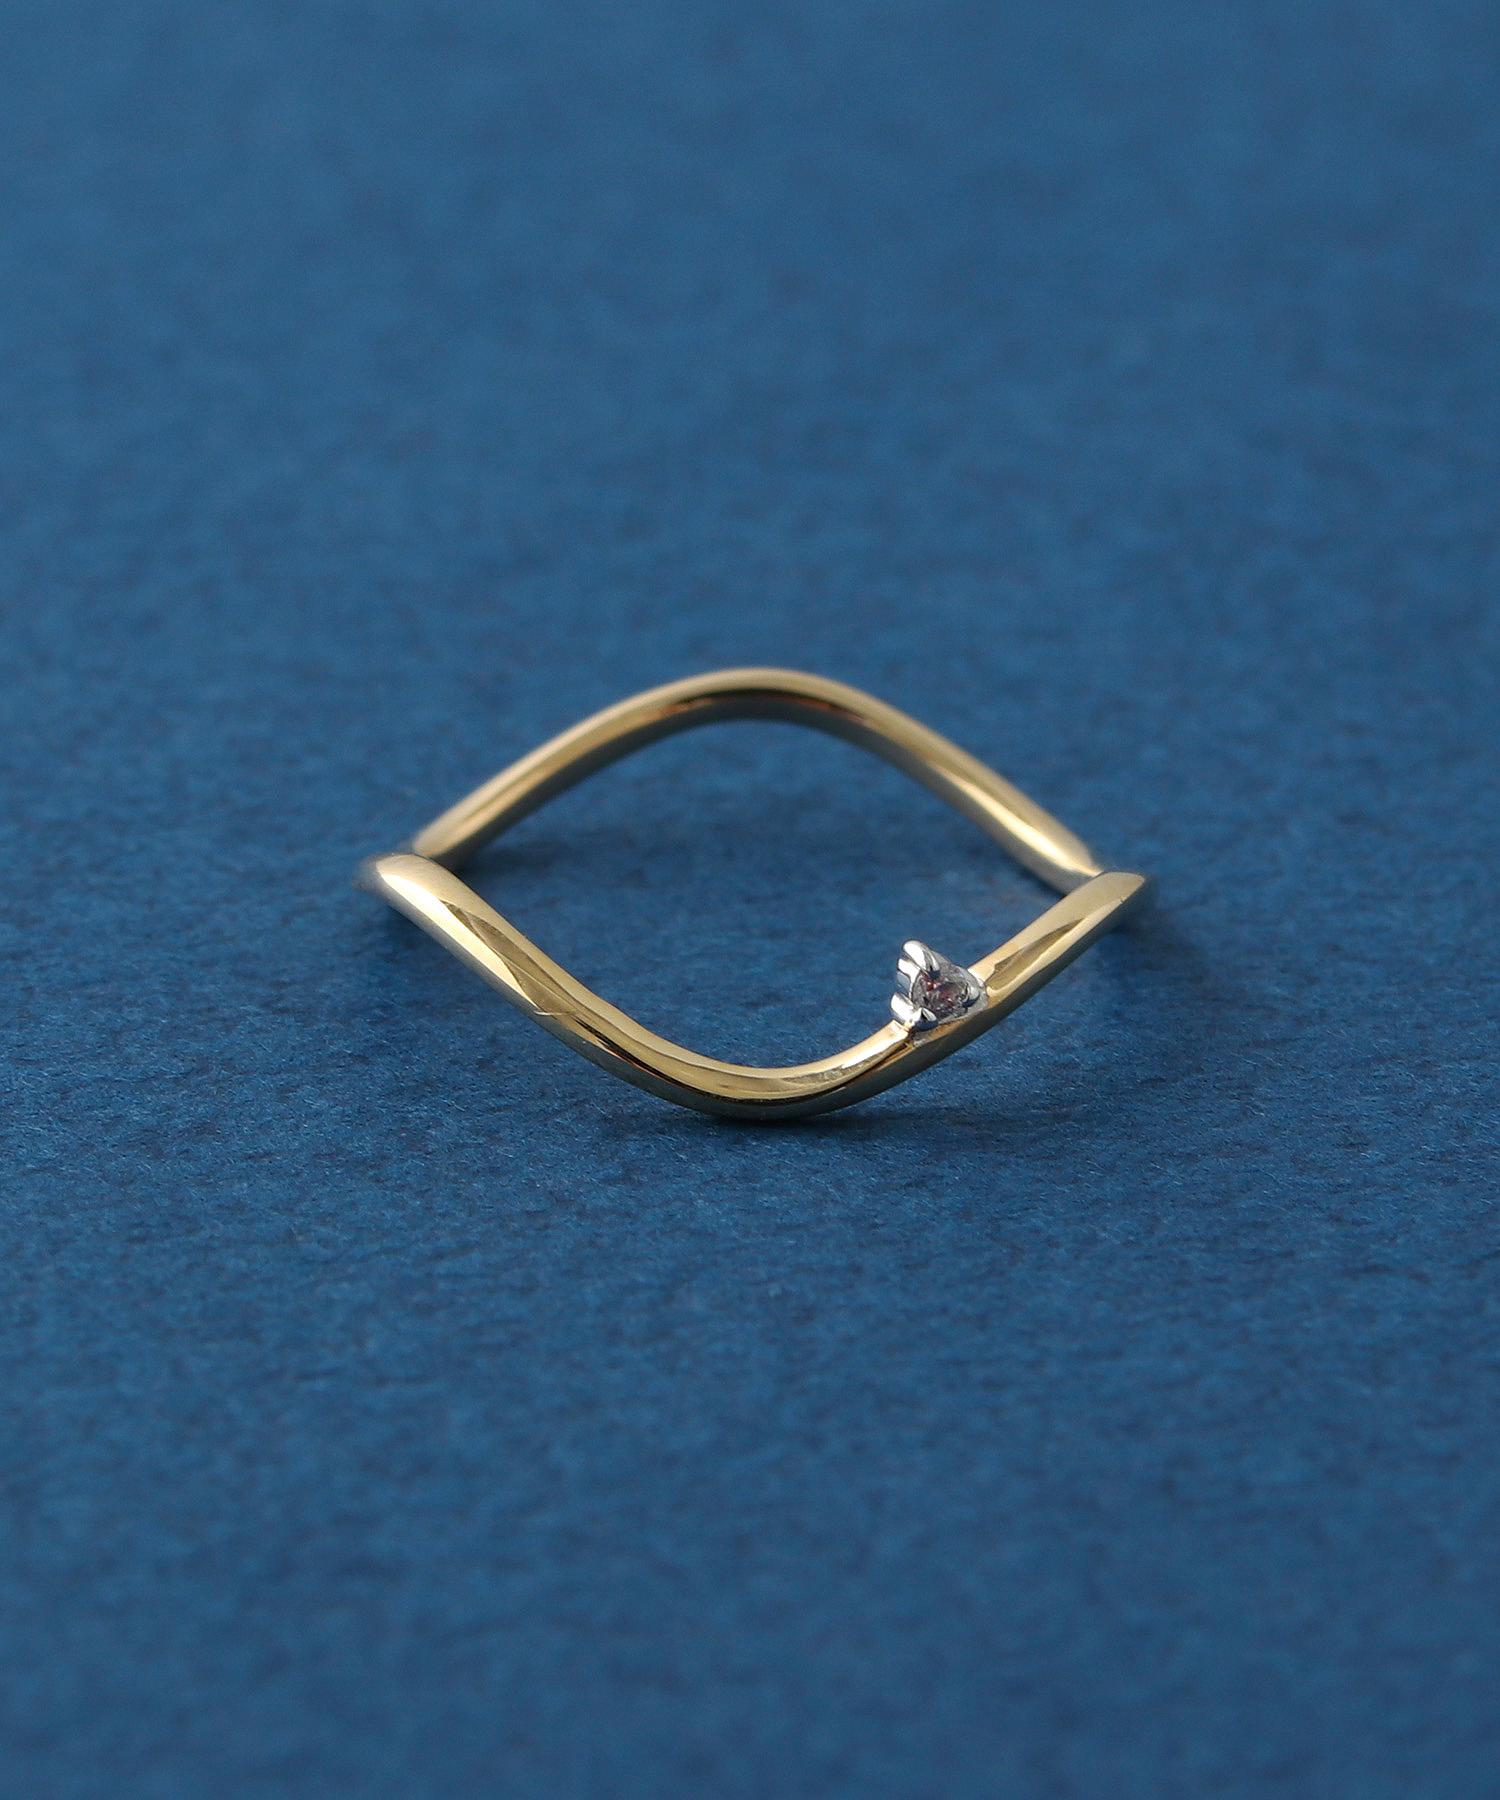 2018 Xmas Limited【ドリームデイ】K10×ダイヤモンド ピンキーリングの写真